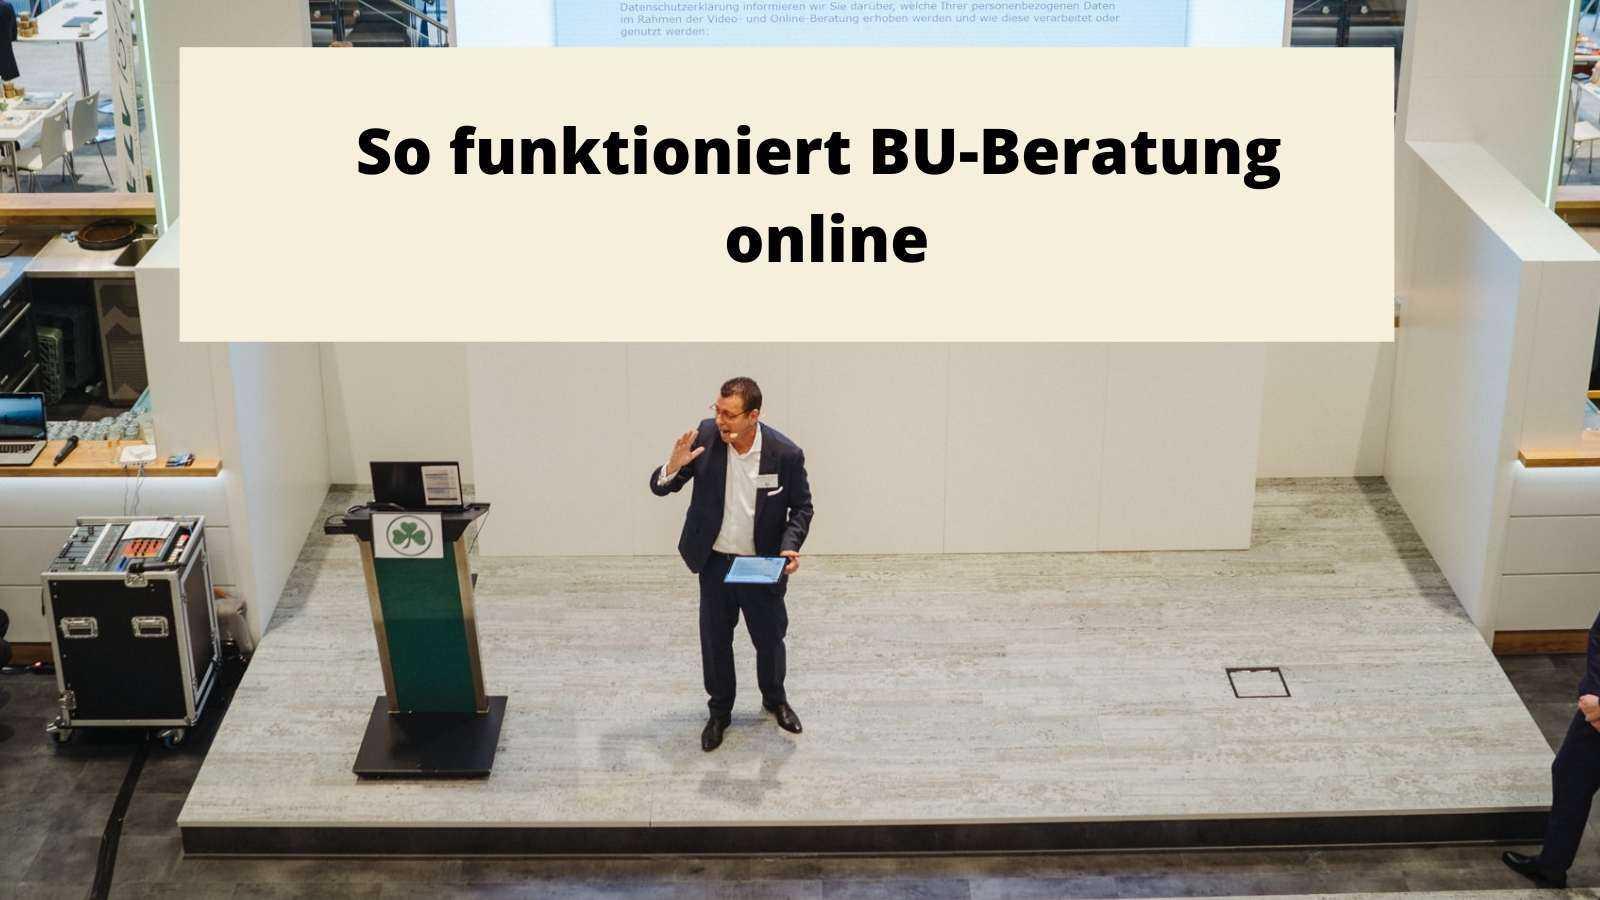 So funktioniert BU-Beratung online